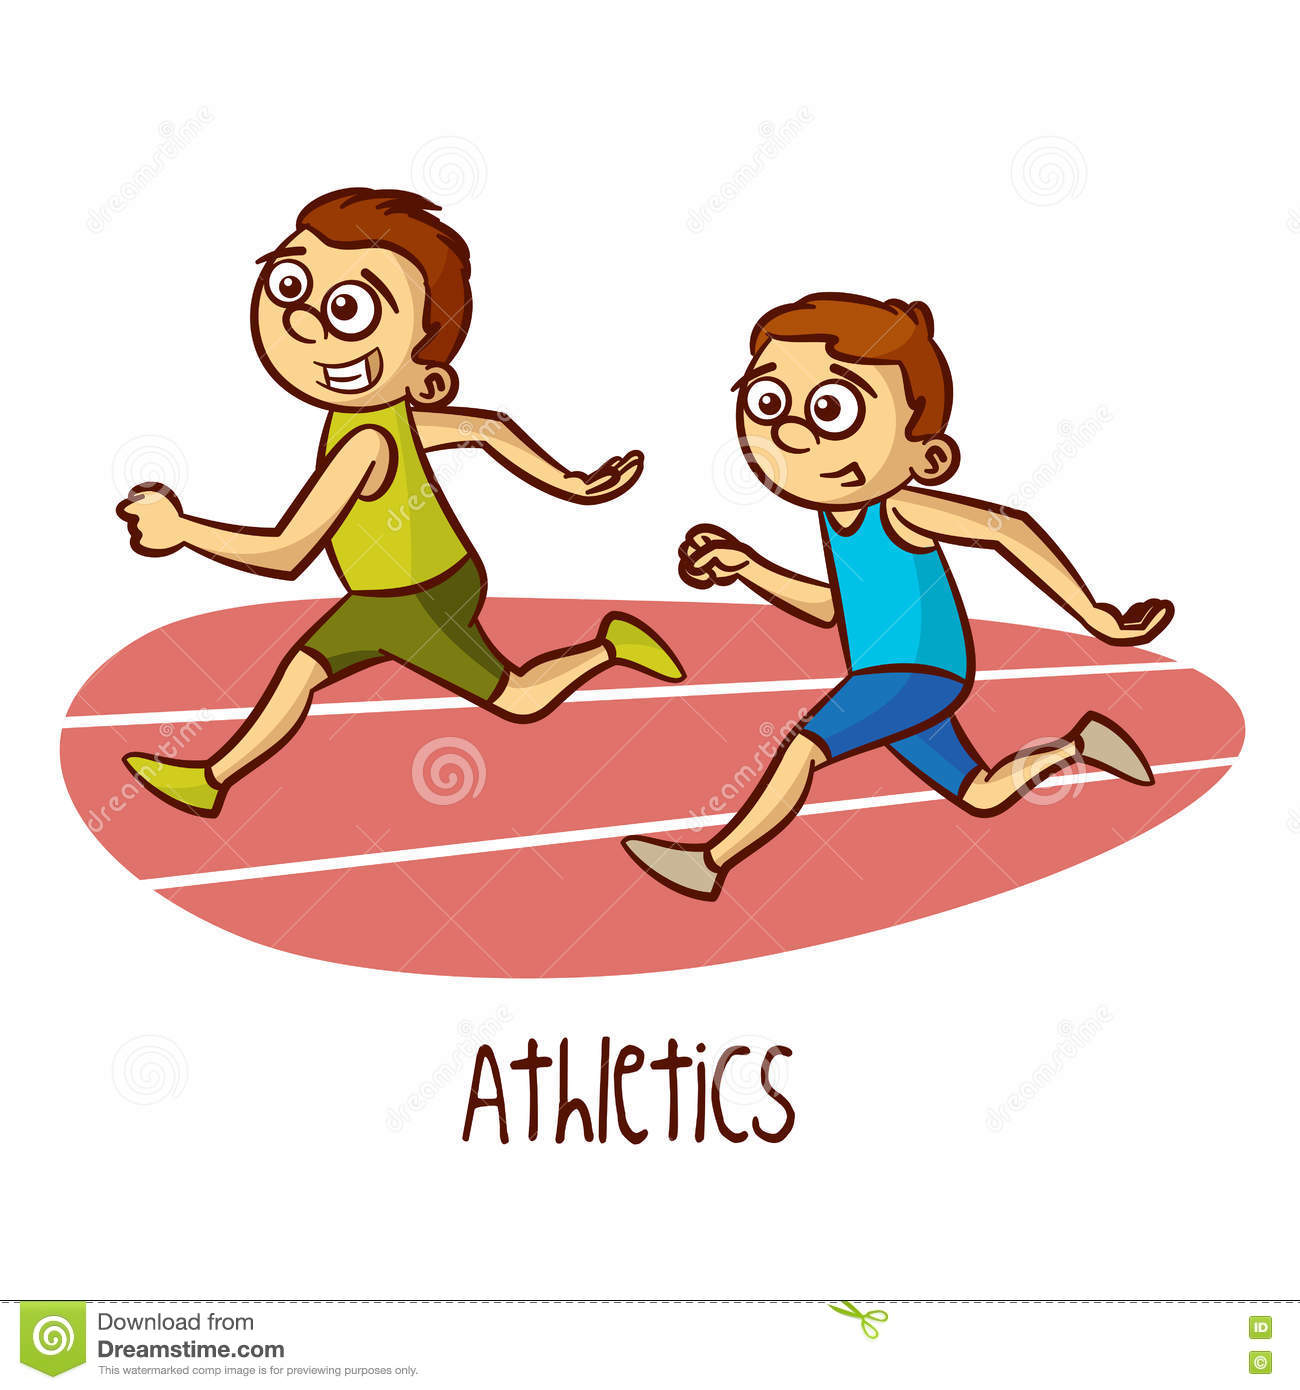 Children athletics clipart.